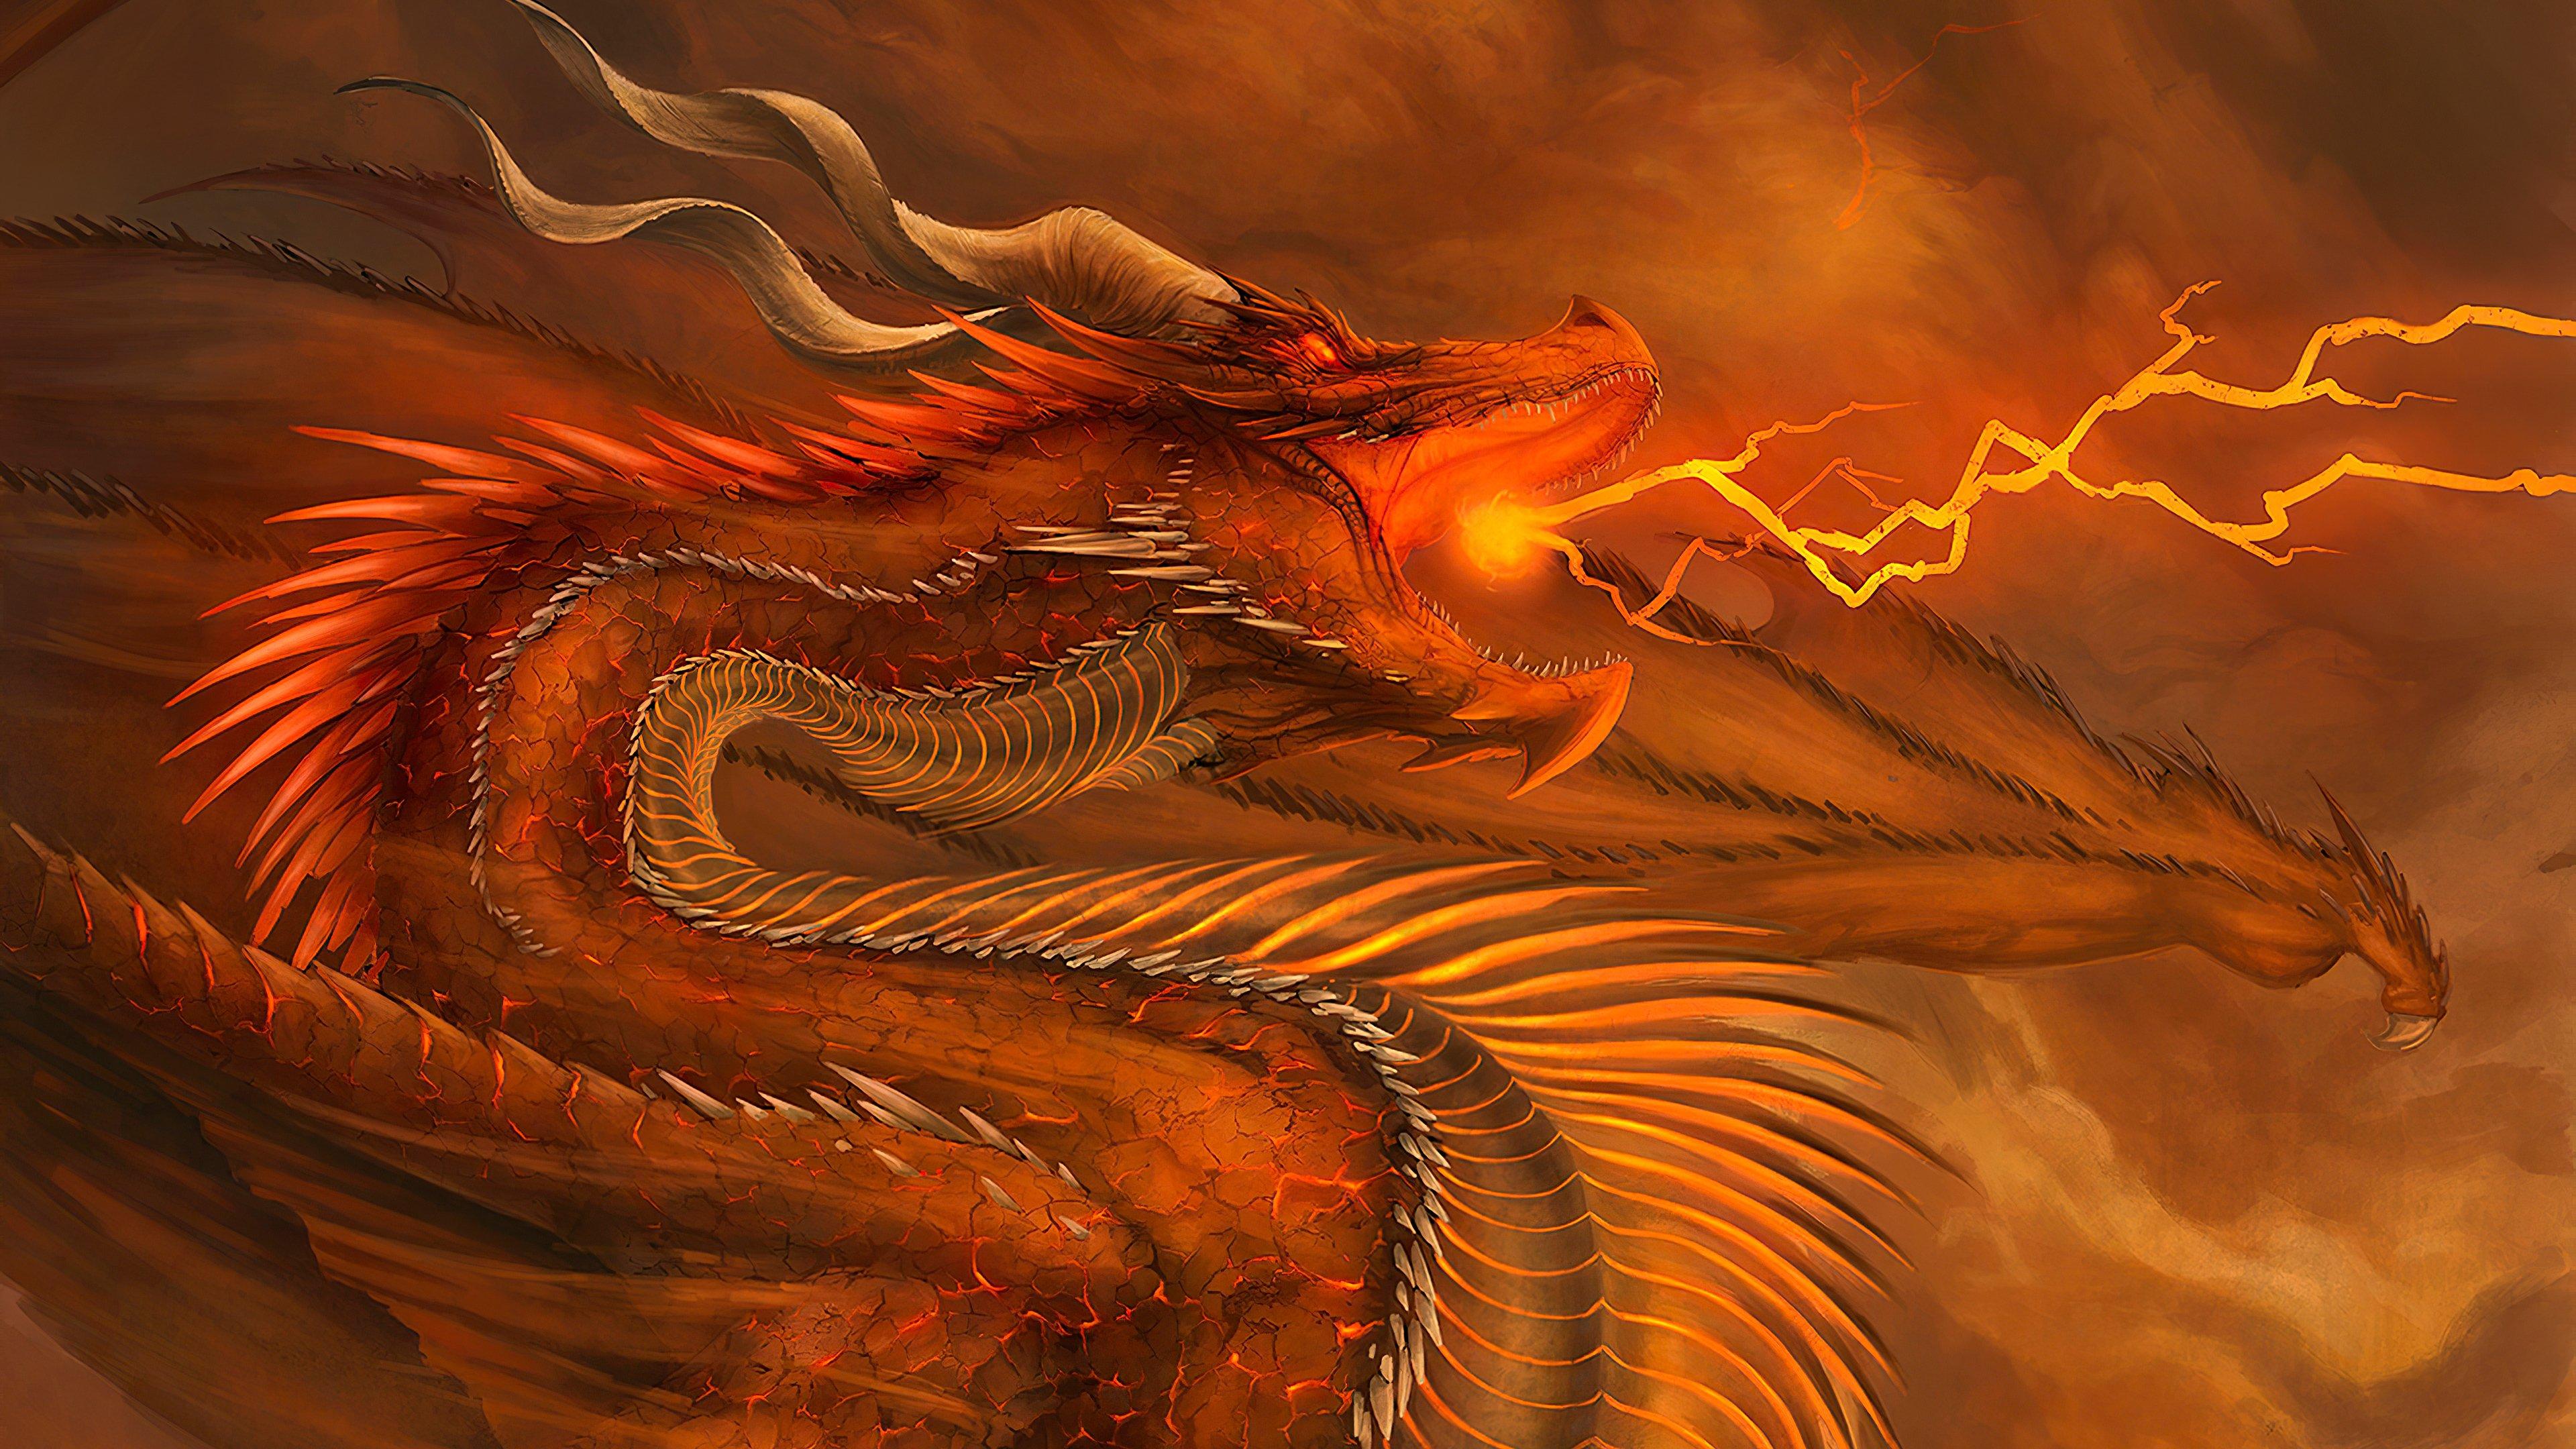 Fondos de pantalla Dragón